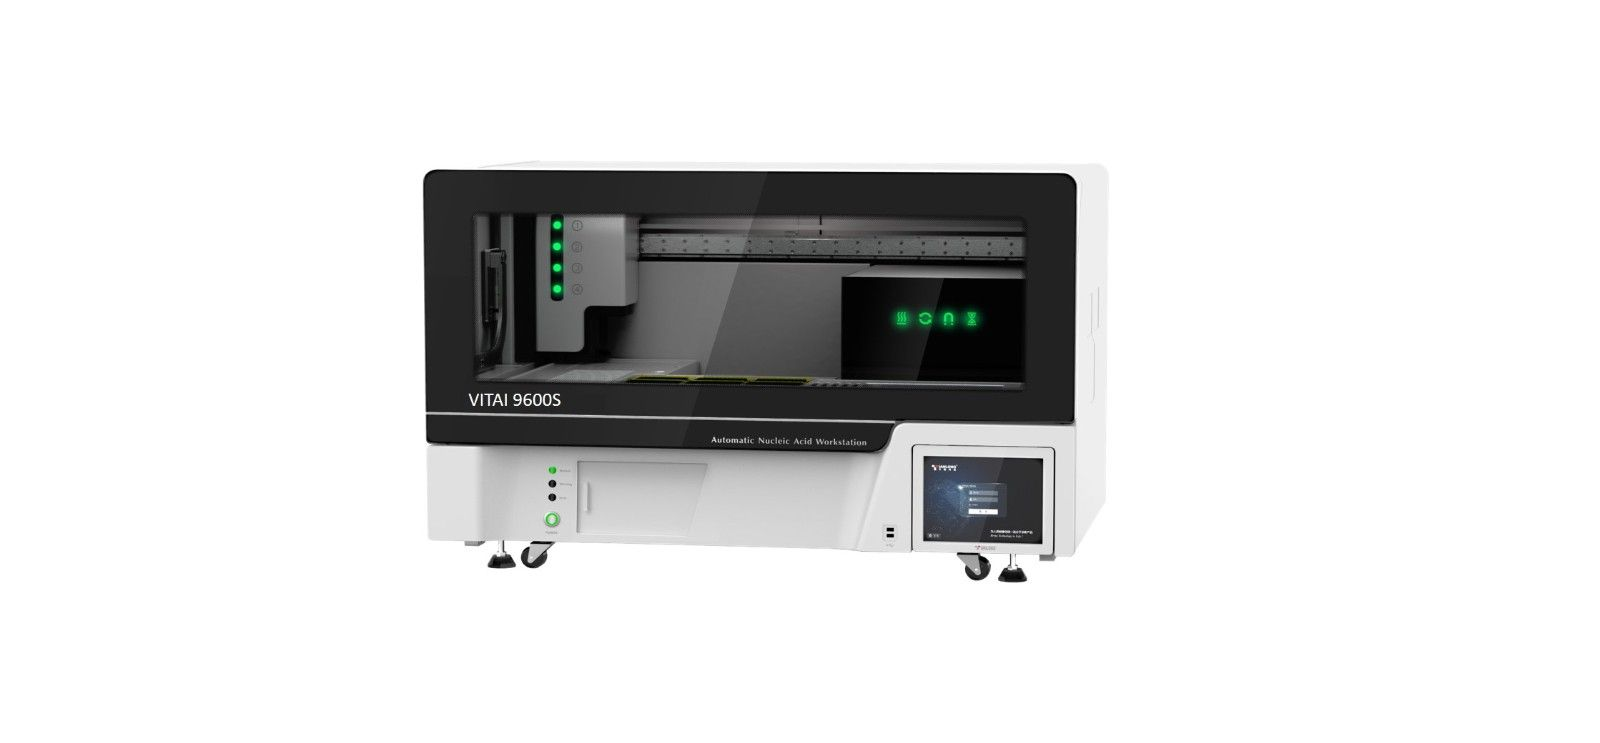 Automated Nucleic Acid Workstation-VITAI 9600S